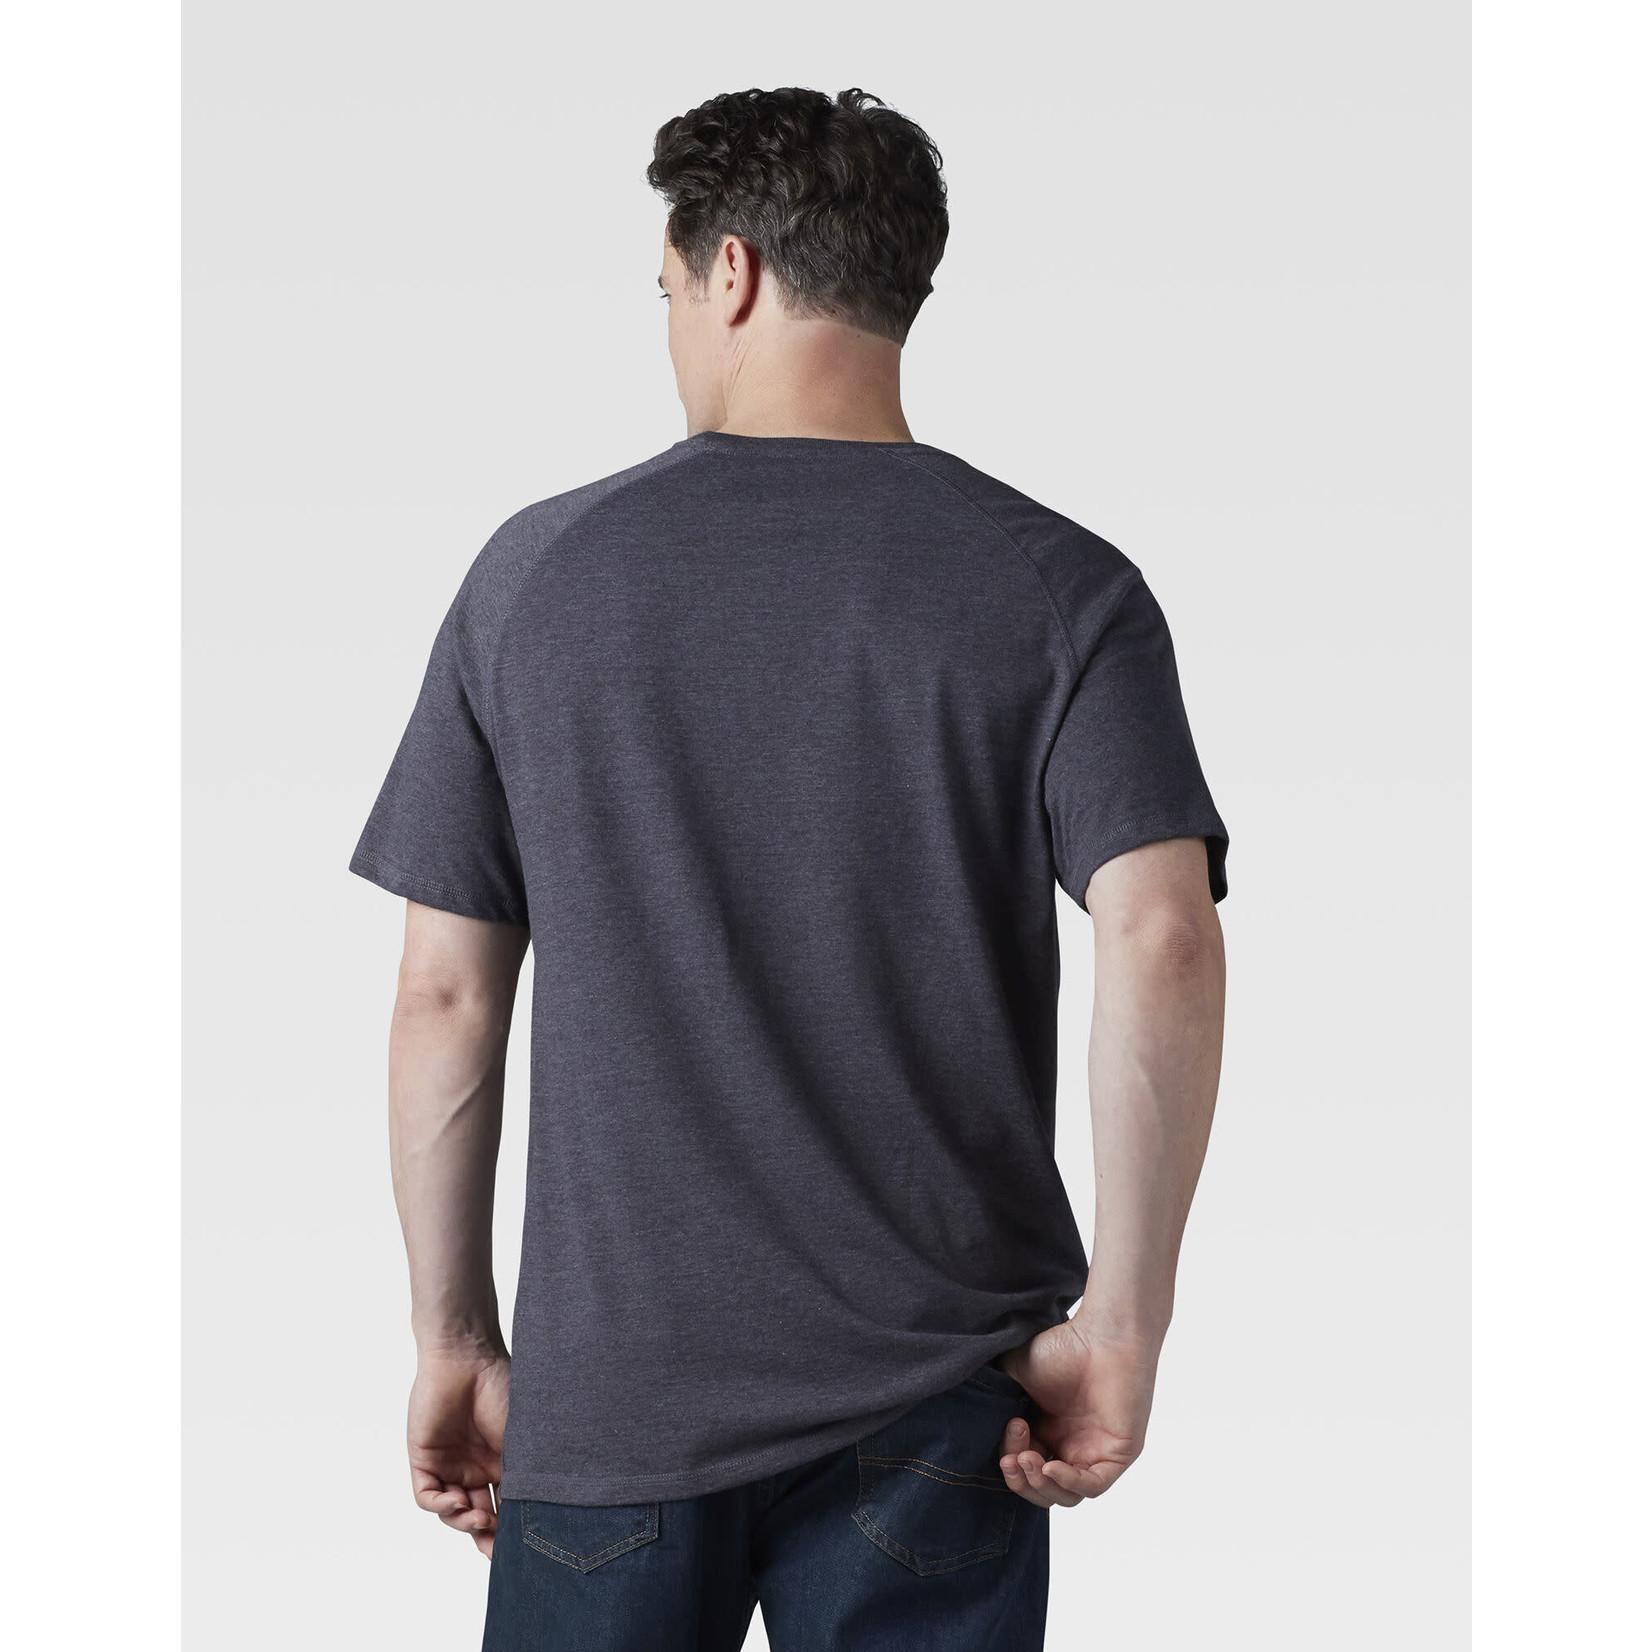 Dickies Dickies Cooling Temp-iQ® Dark Grey Performance Short Sleeve T-Shirt